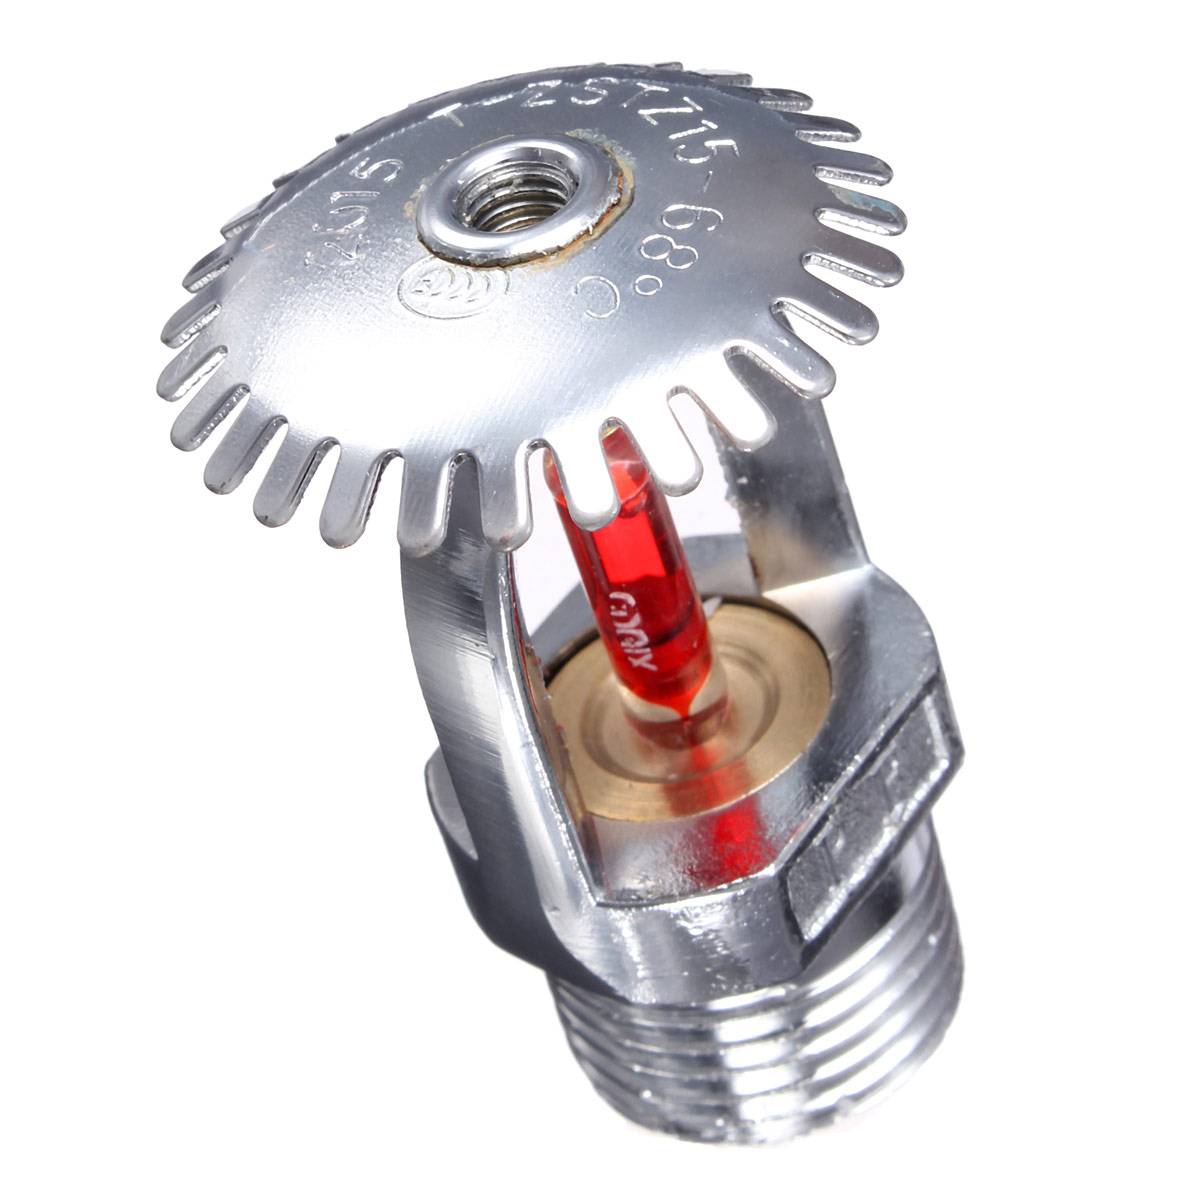 1pcs 5x3.4cm 68 Degrees Pendent For Fire Extinguishing System Protection Sprinkler Head New Pendent Sprinklers